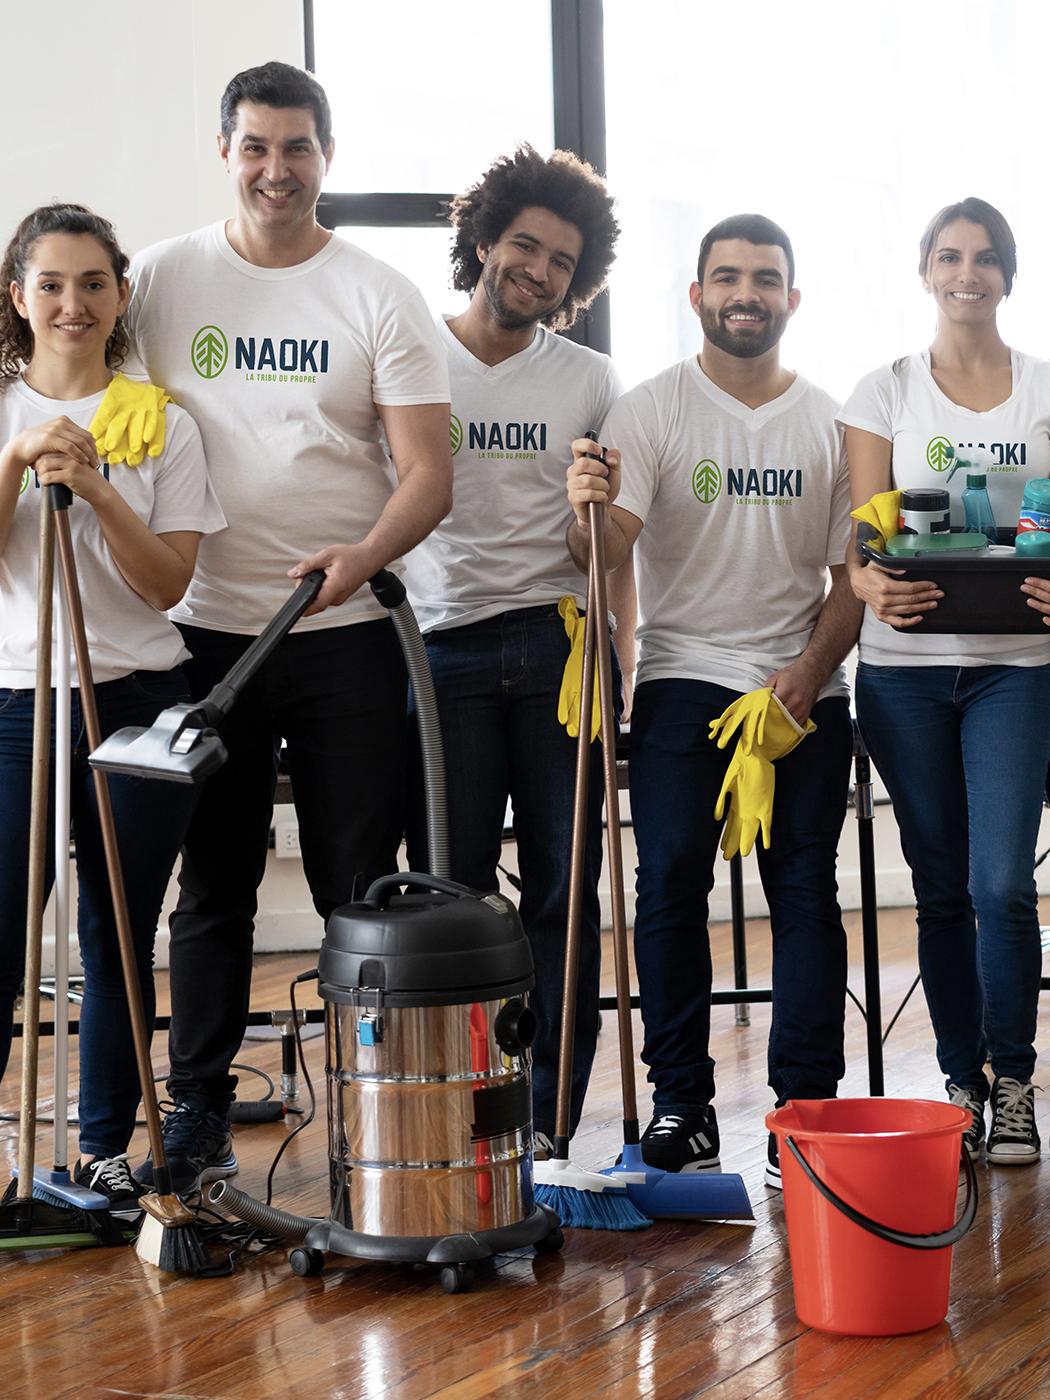 Société de nettoyage NAOKI propreté